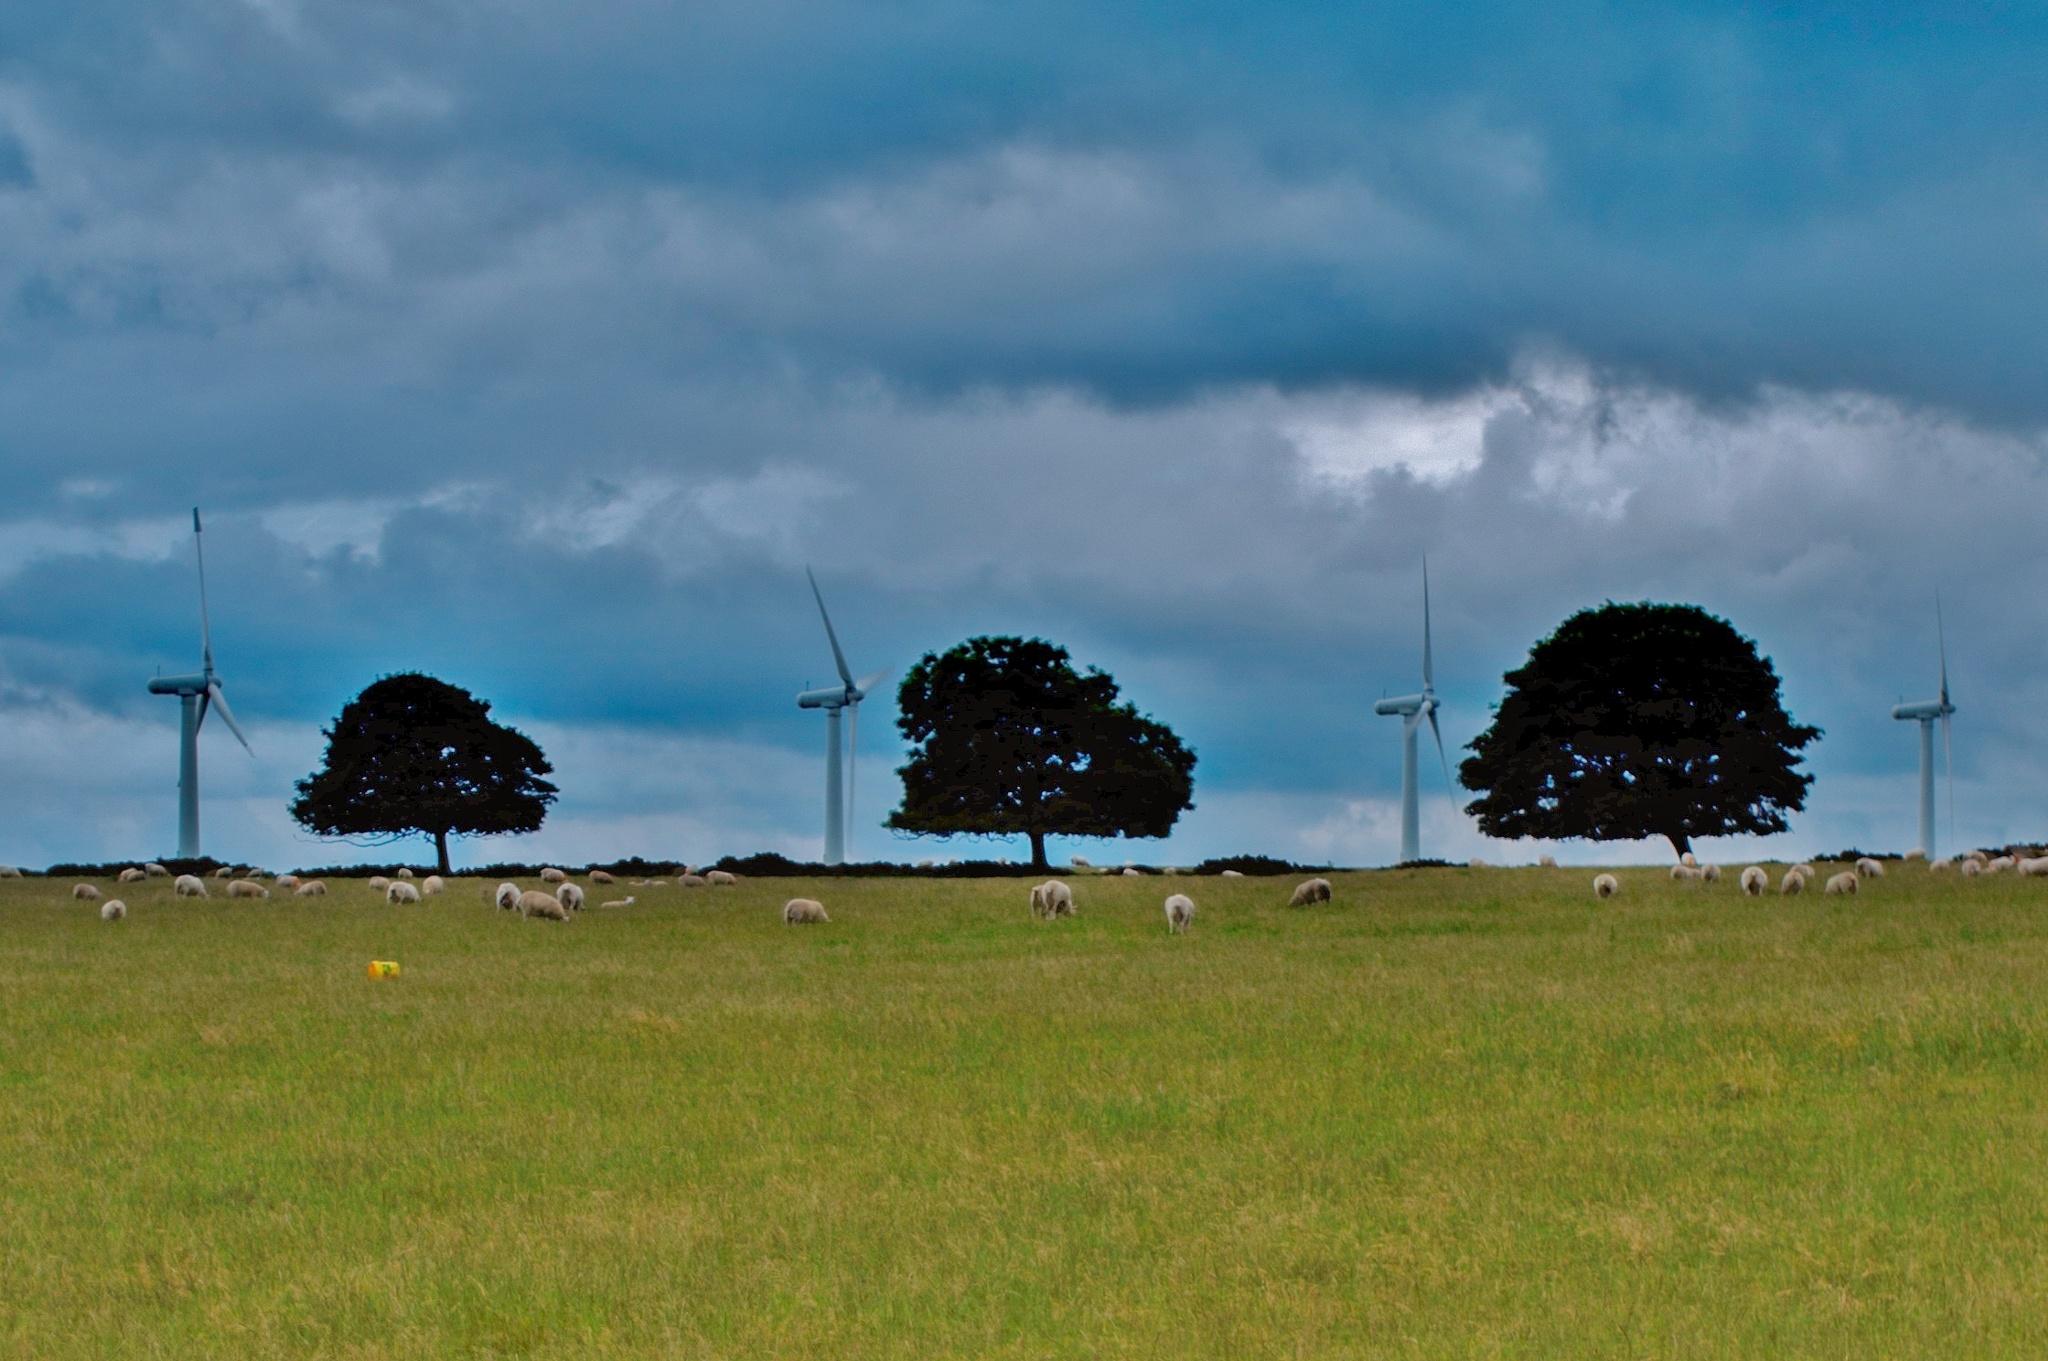 Wind farm by Russ Burton